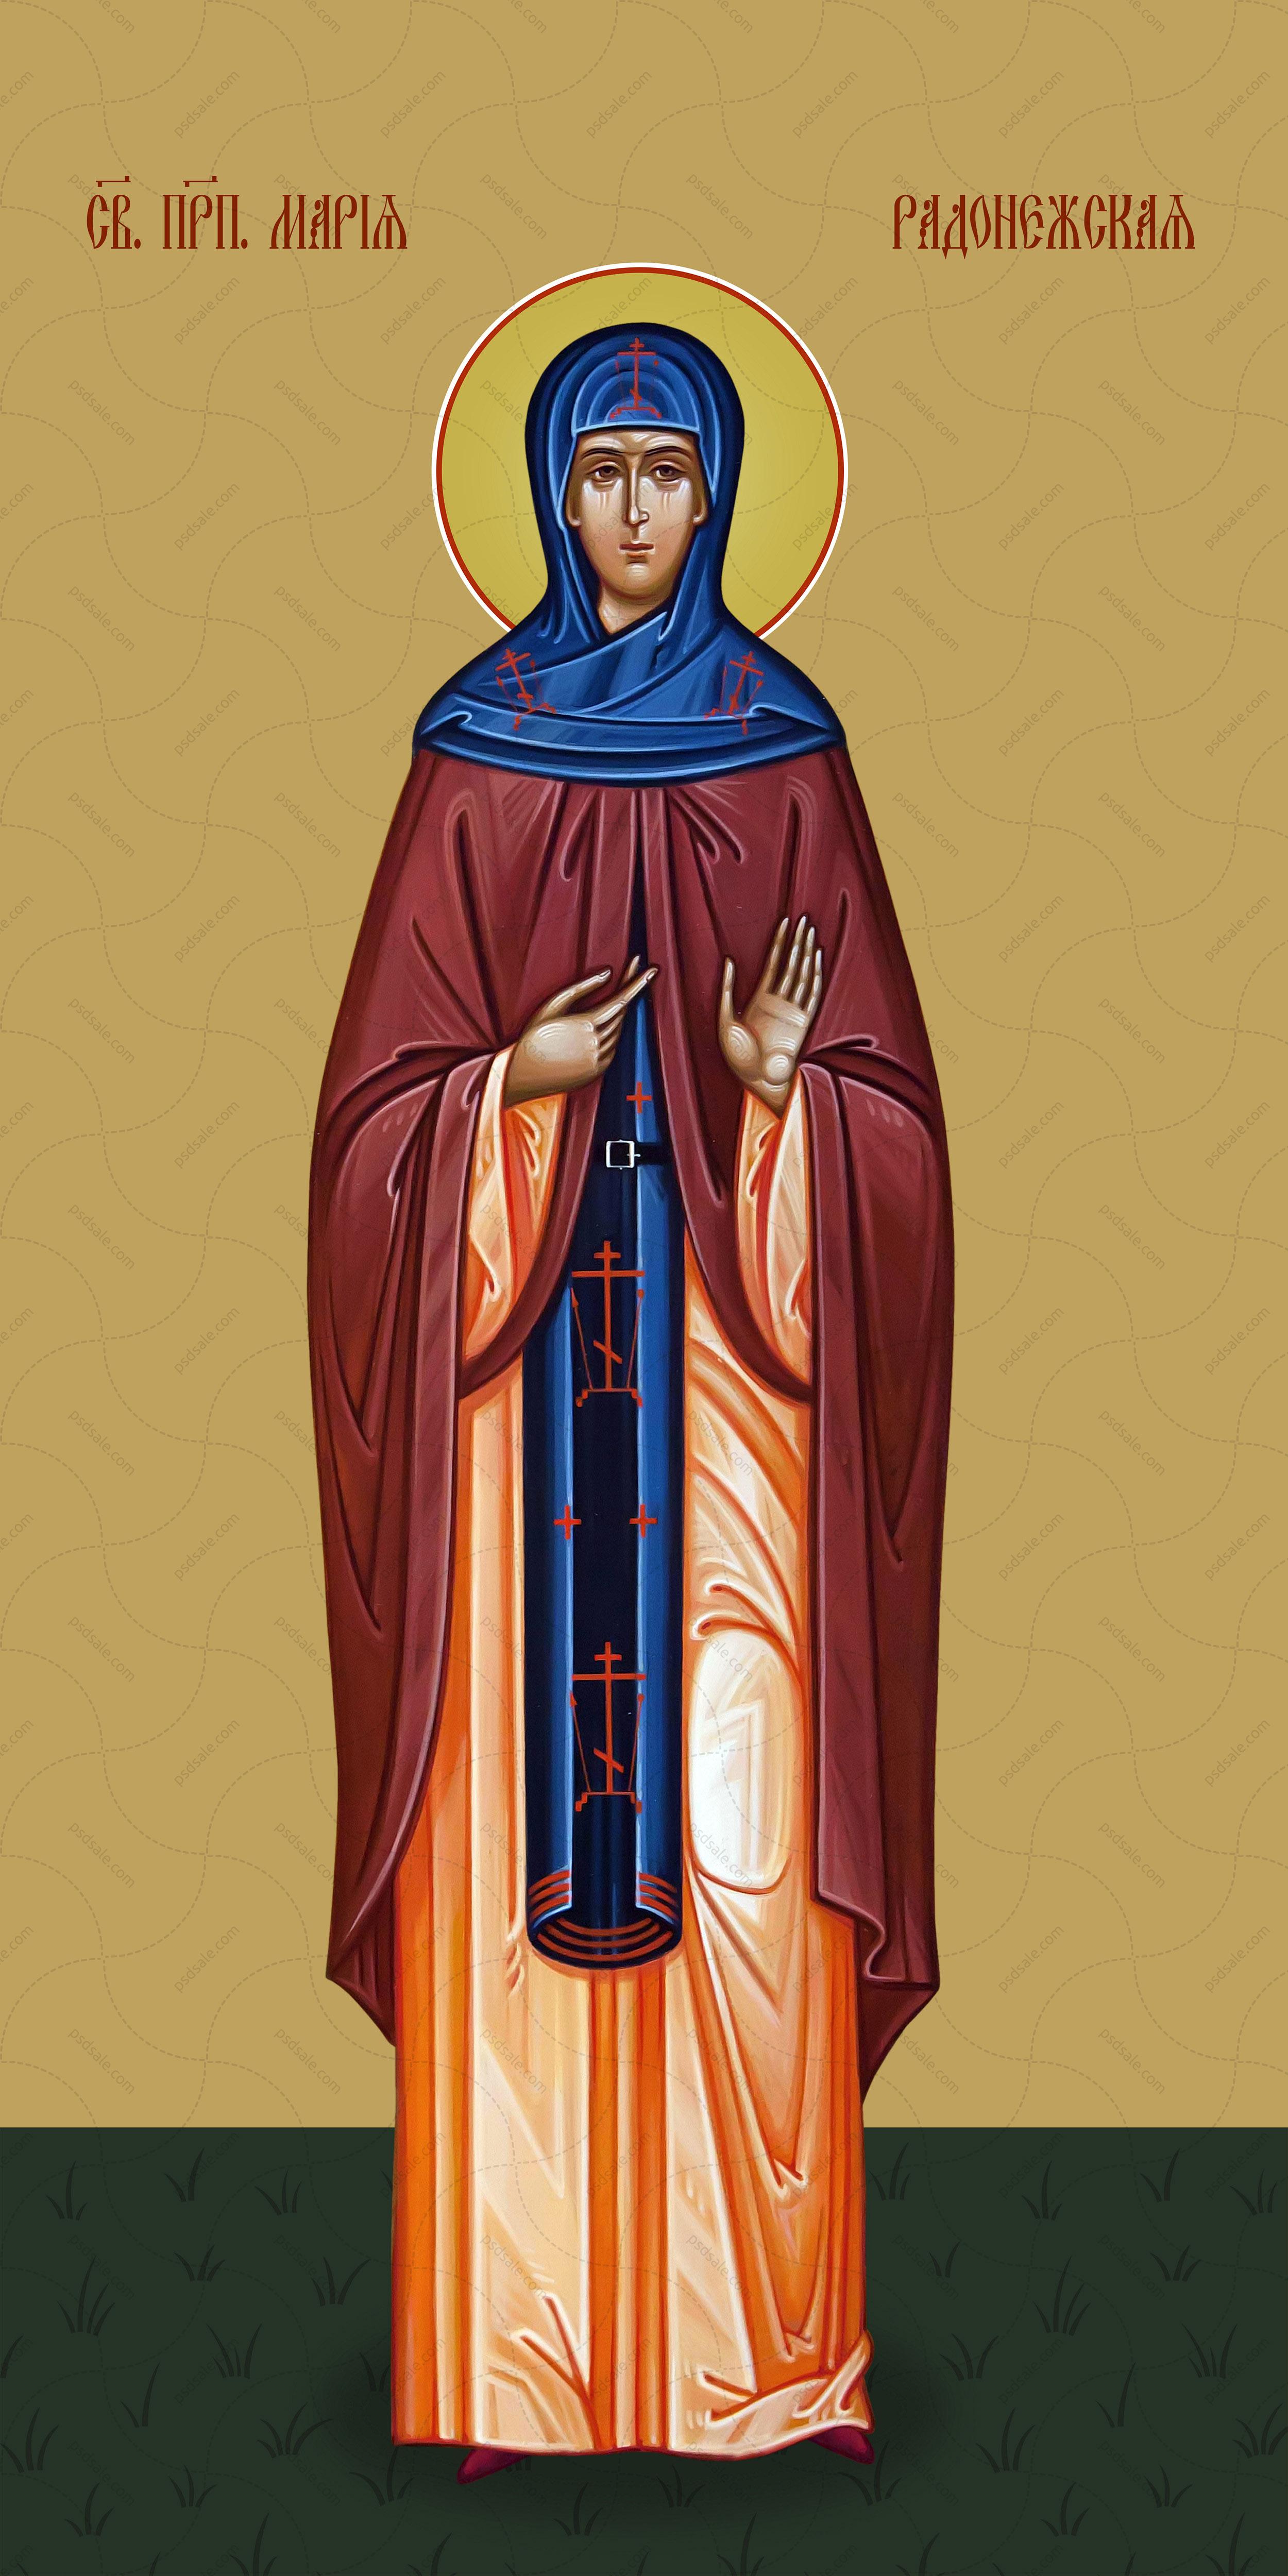 Мерная икона, Мария Радонежская, святая преподобная